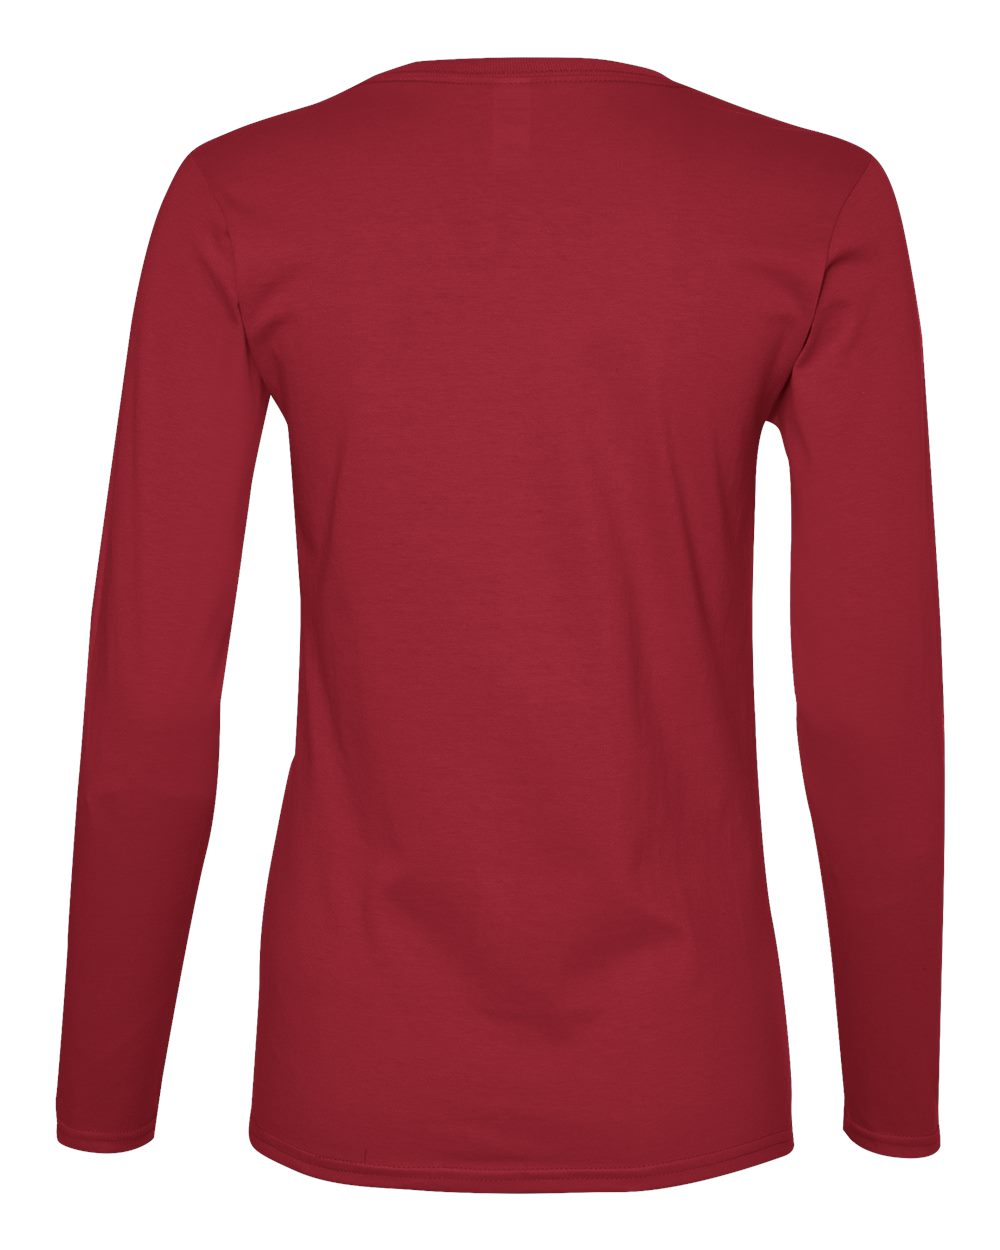 Anvil-Womens-Lightweight-Long-Sleeve-T-Shirt-884L-Size-S-2XL thumbnail 20